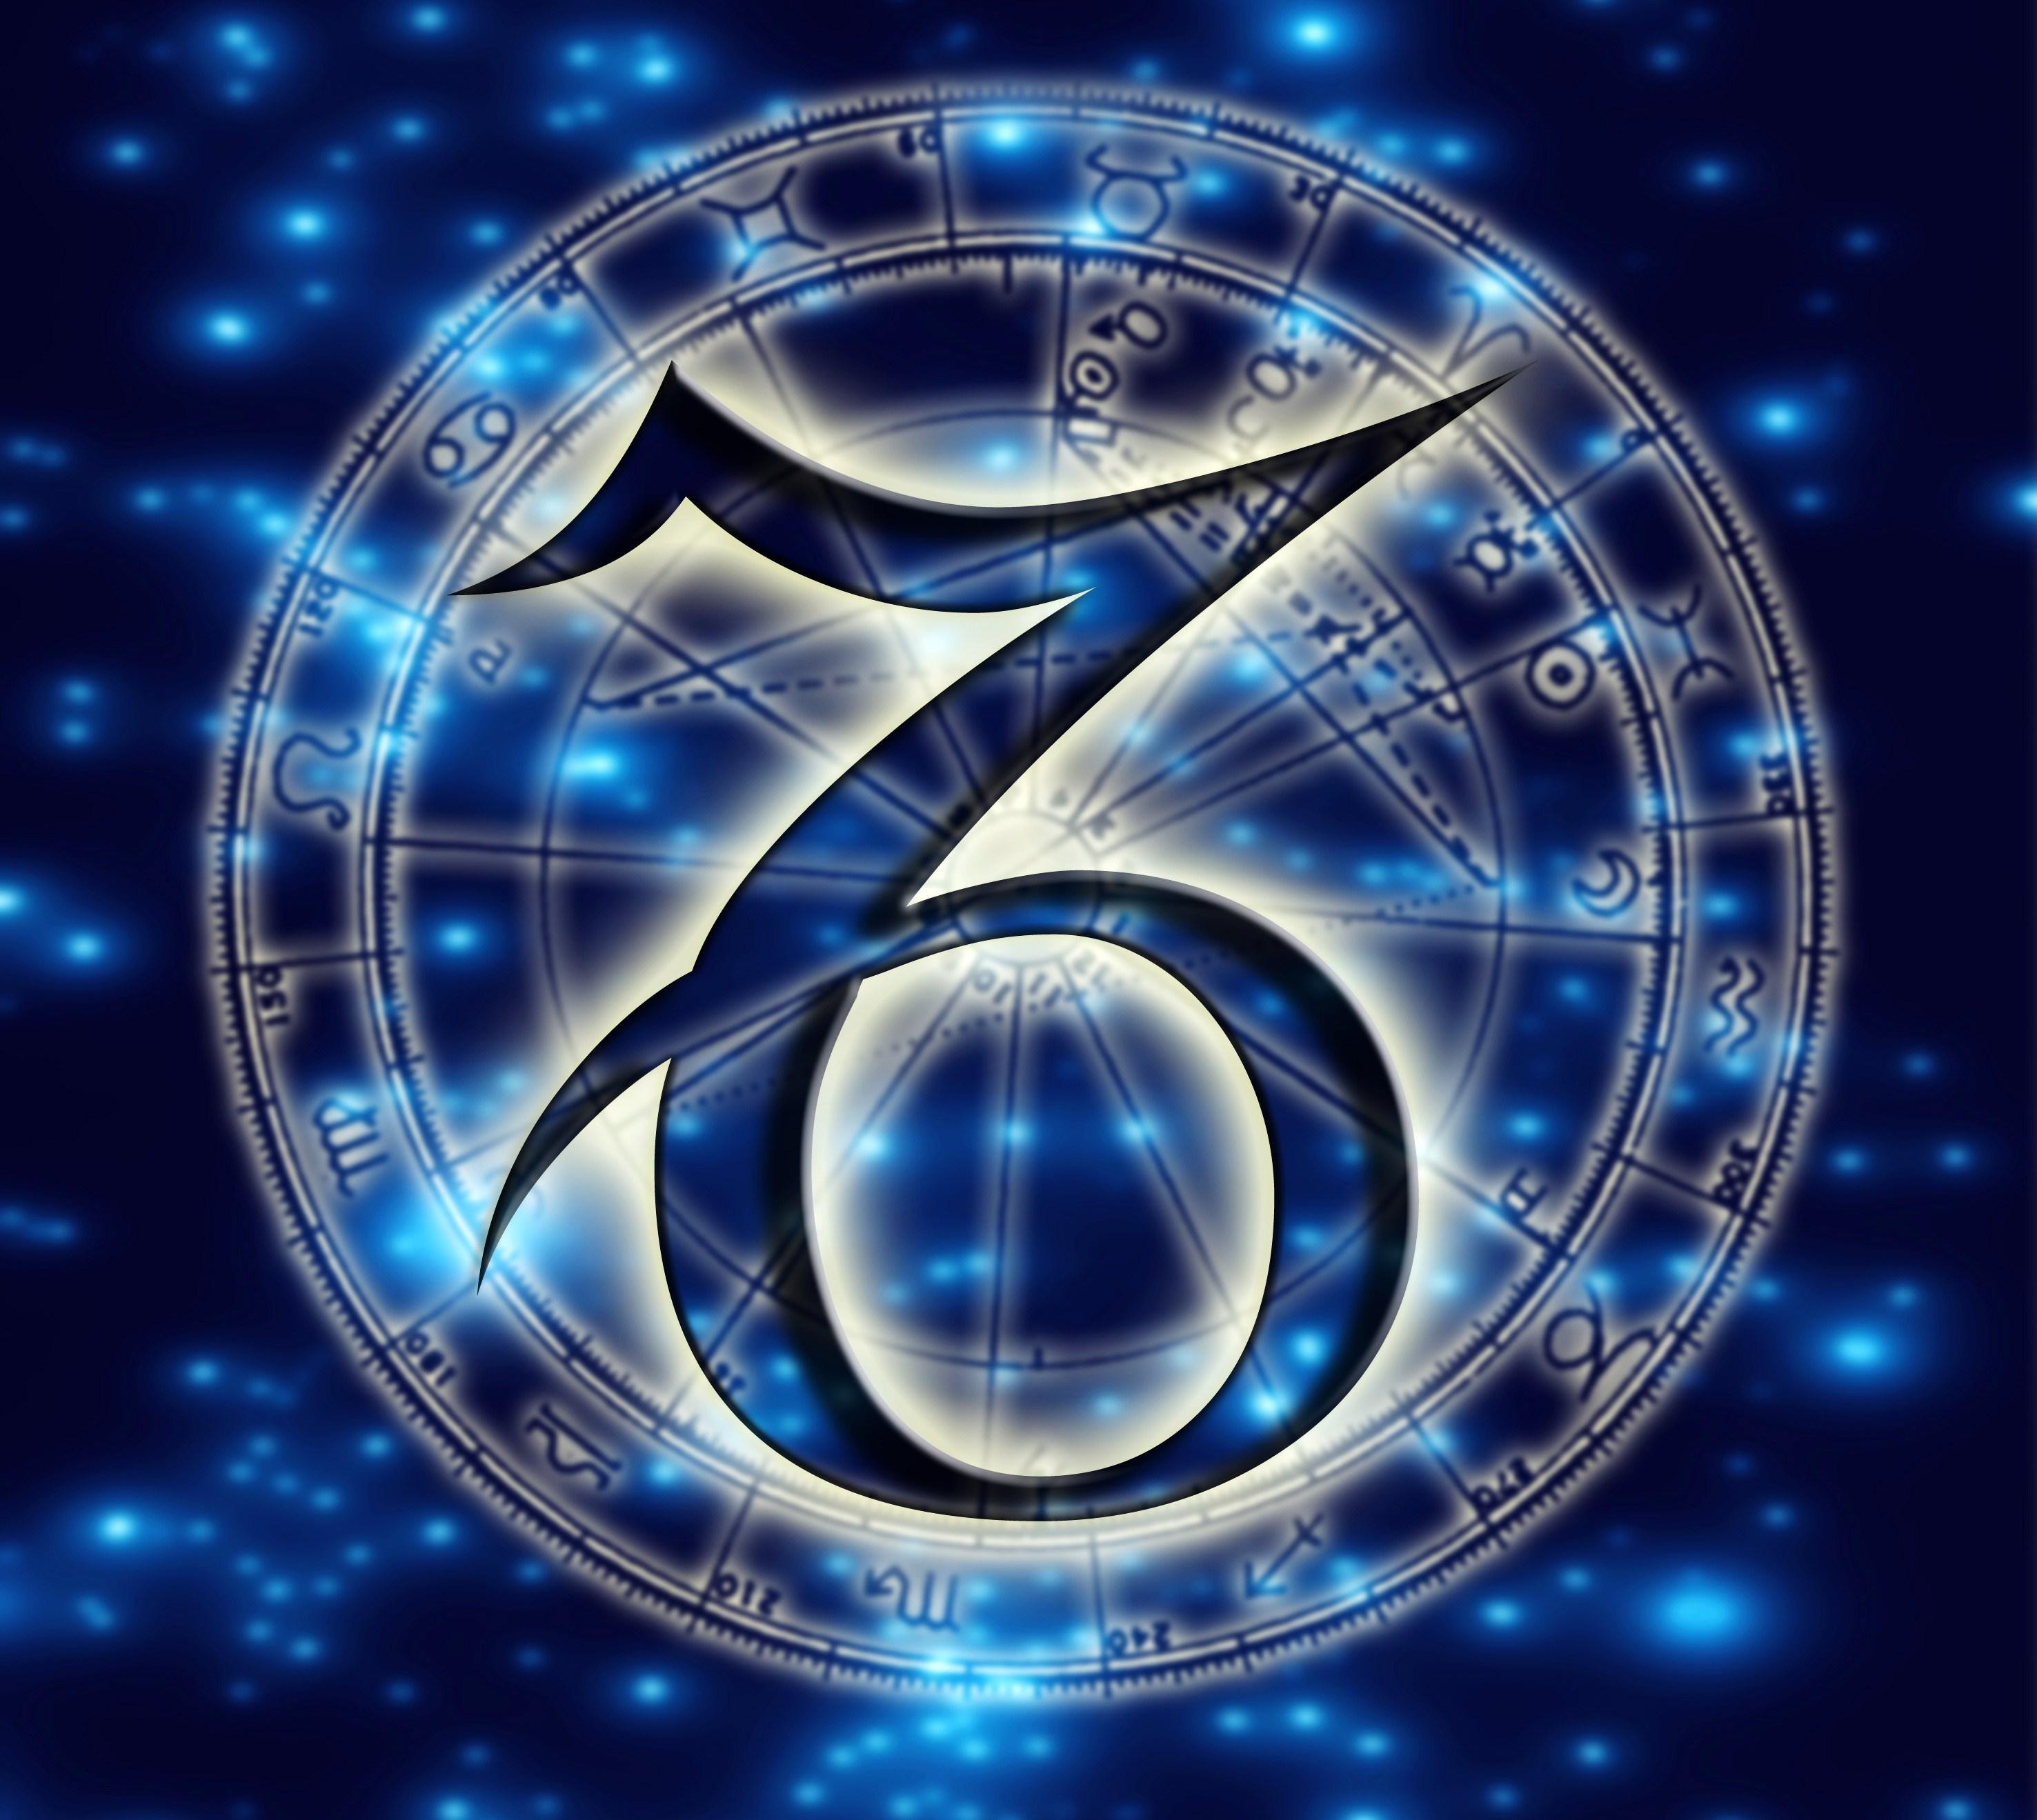 Знак Зодиака Близнецы 22 мая  21 июня  женщина  Знак